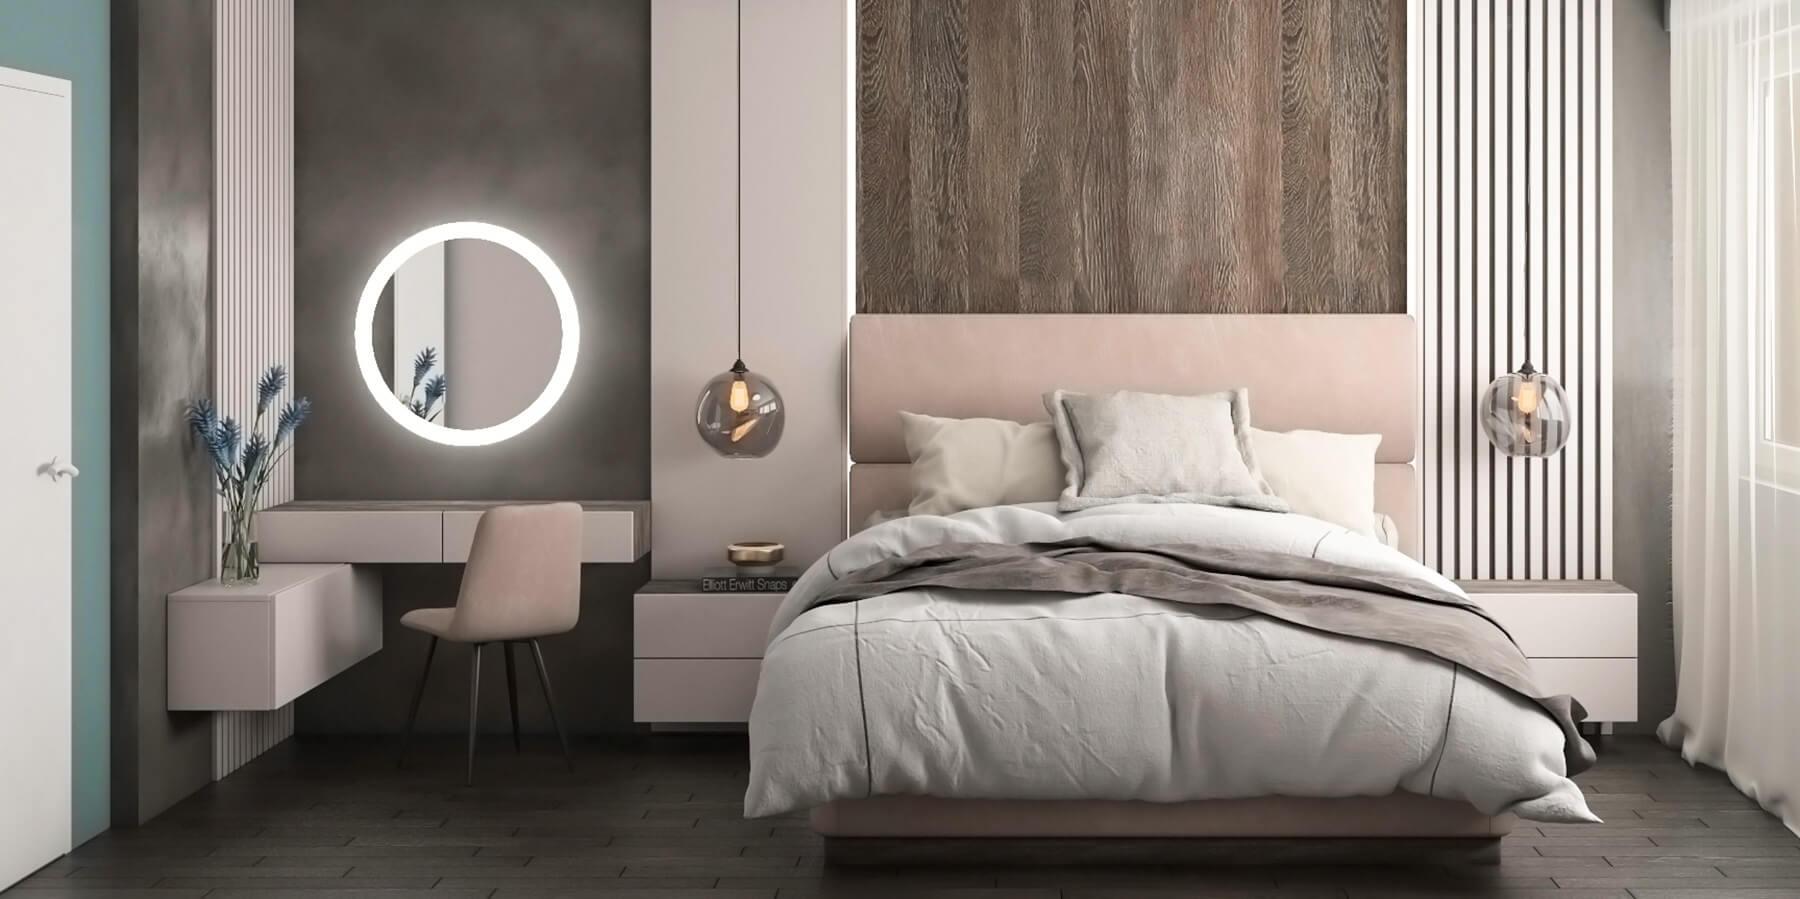 interiorno-studio-za-interioren-dizain-esteta-proektanti-